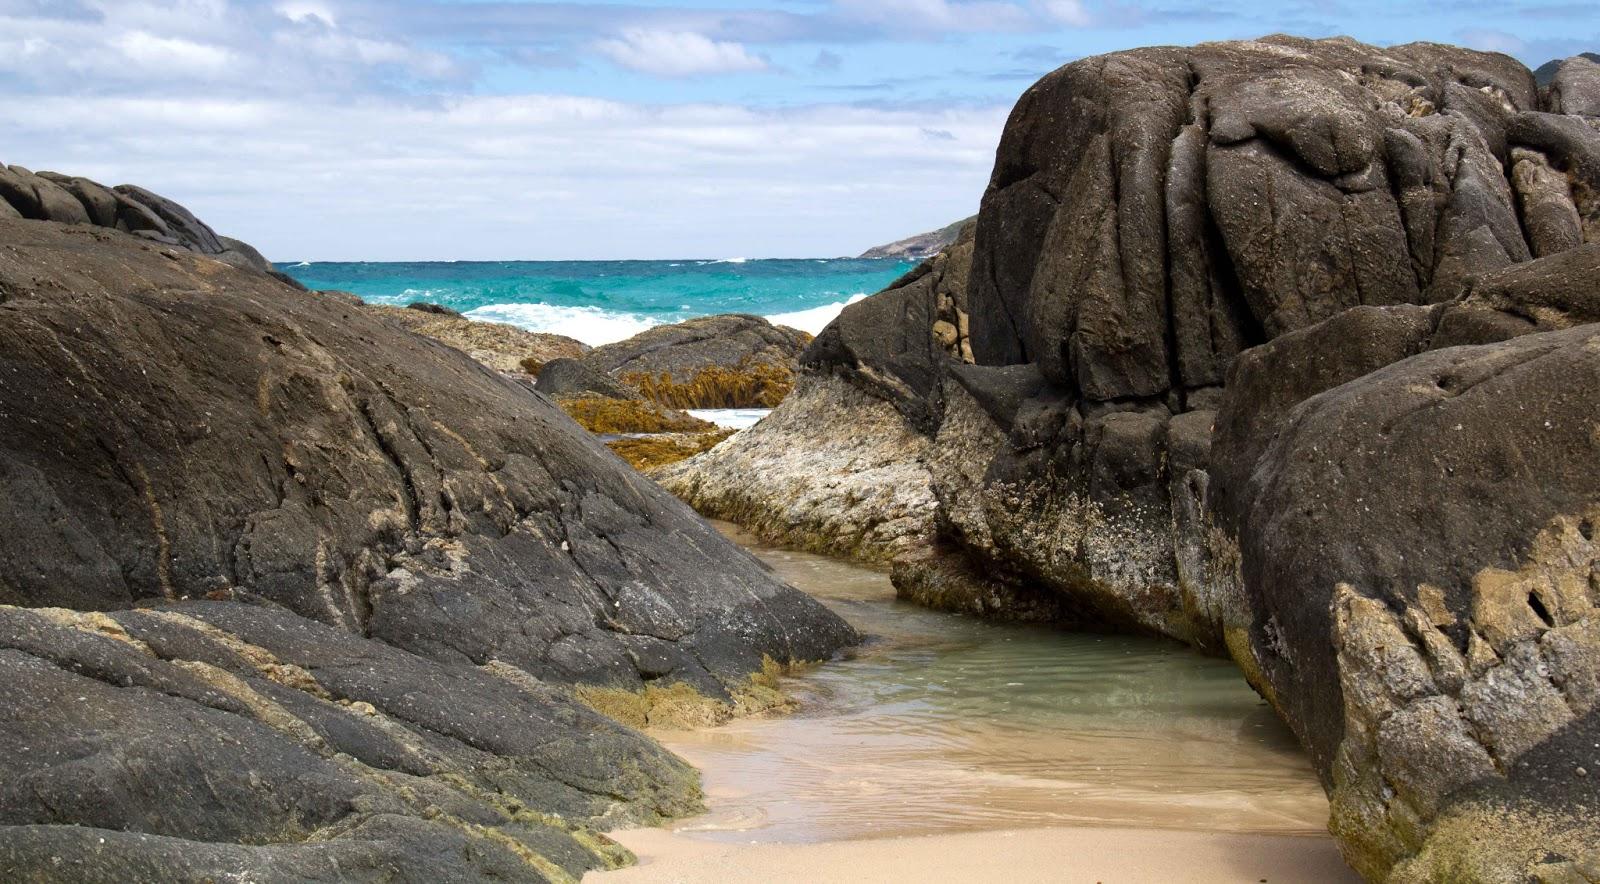 Walpole Australia  City new picture : Mandalay Beach, Walpole Nornalup National Park, Western Australia ...